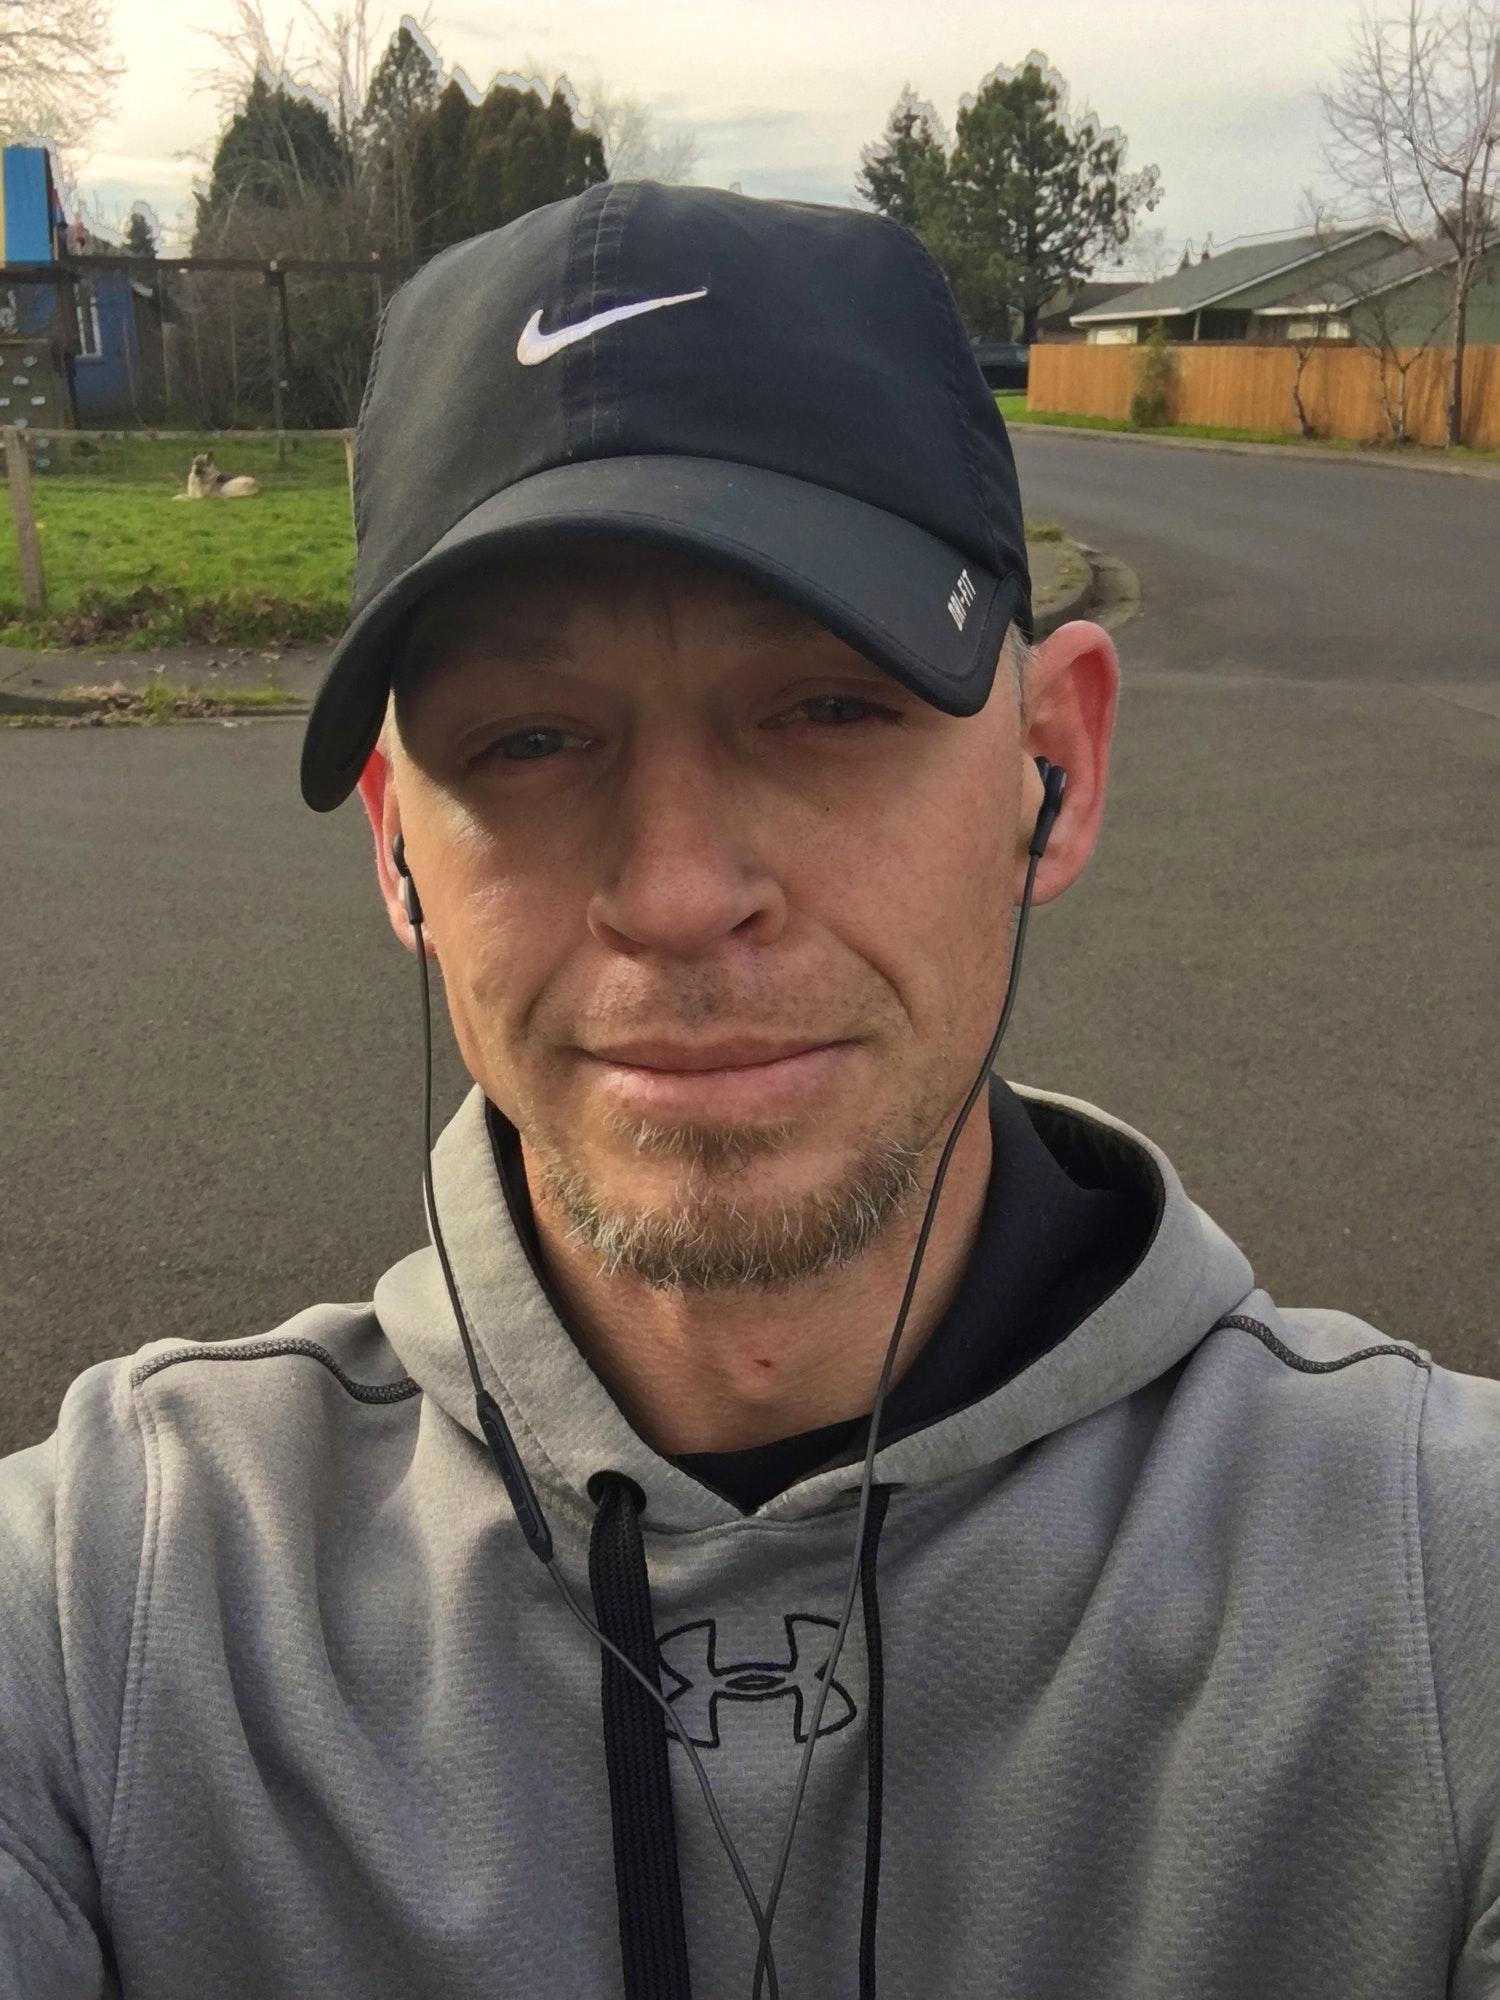 Shadrach W. teaches tennis lessons in Tremonton , UT